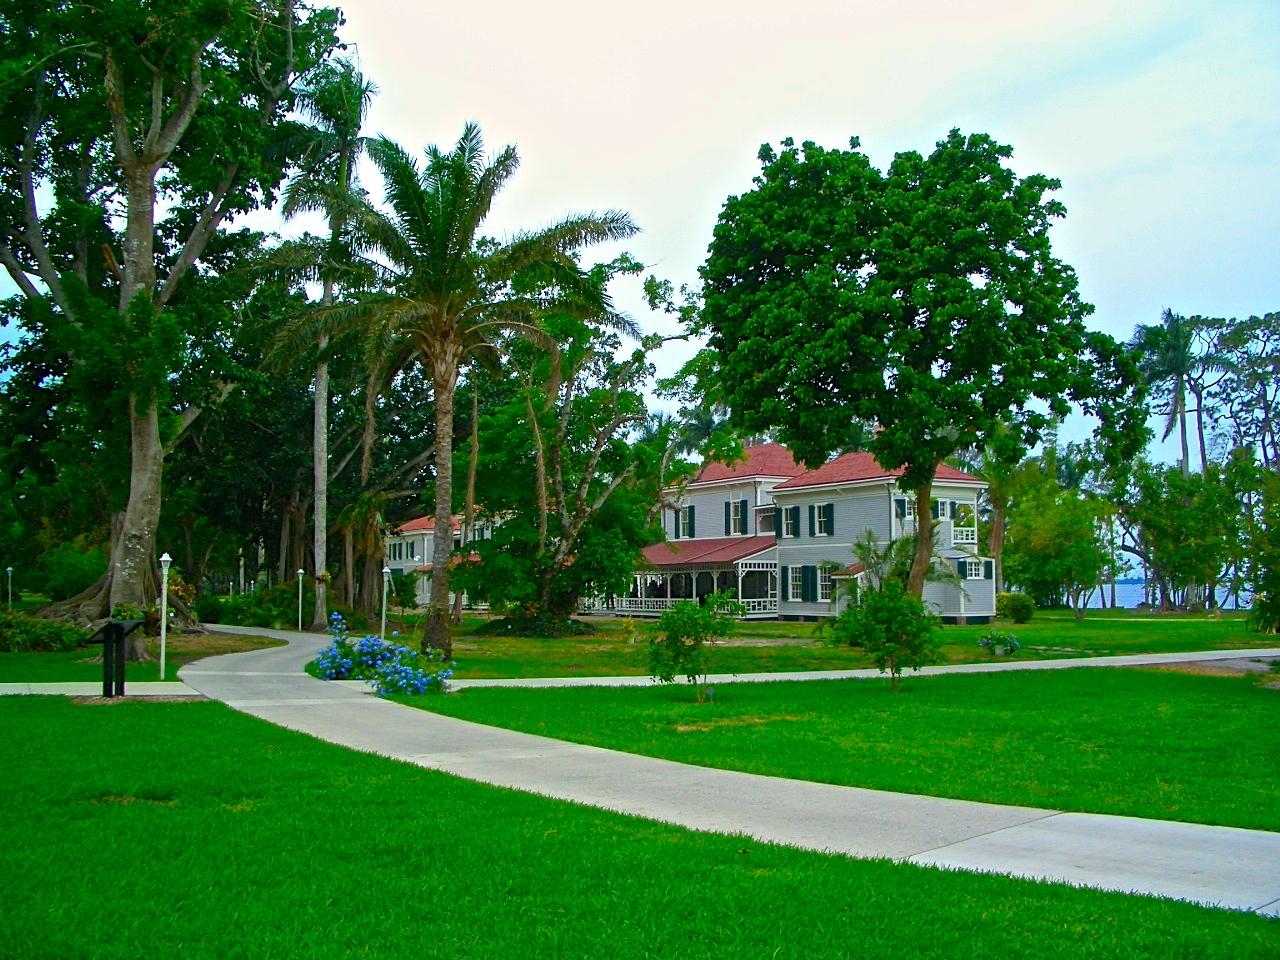 Sanibel beach funandfork historic edison ford winter estate and gardens in ft myers florida nvjuhfo Choice Image